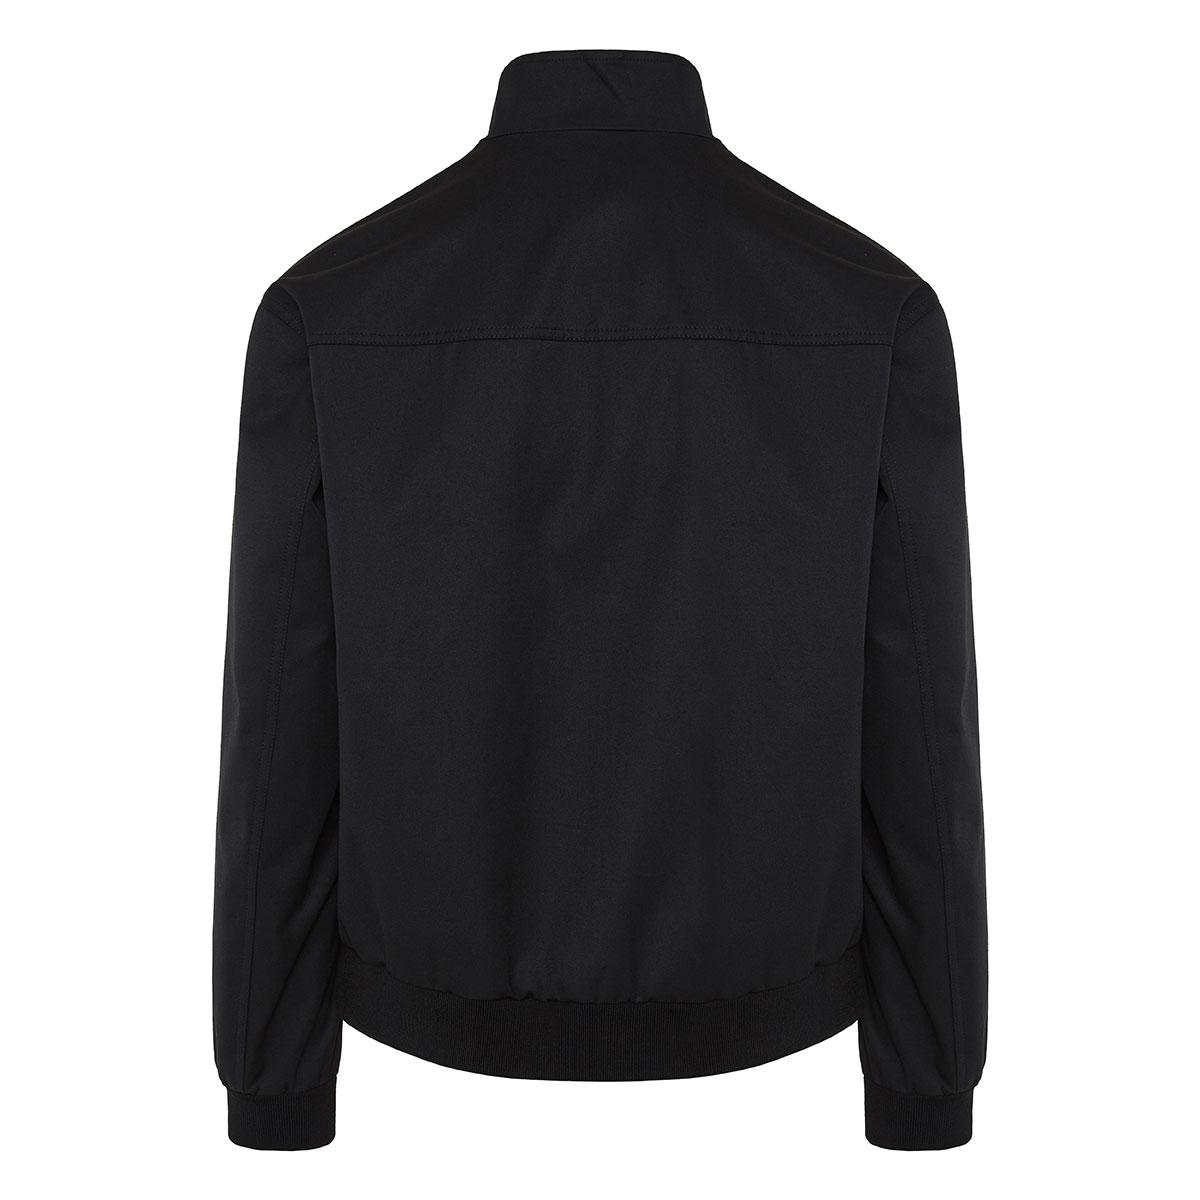 VLTN technical jacket